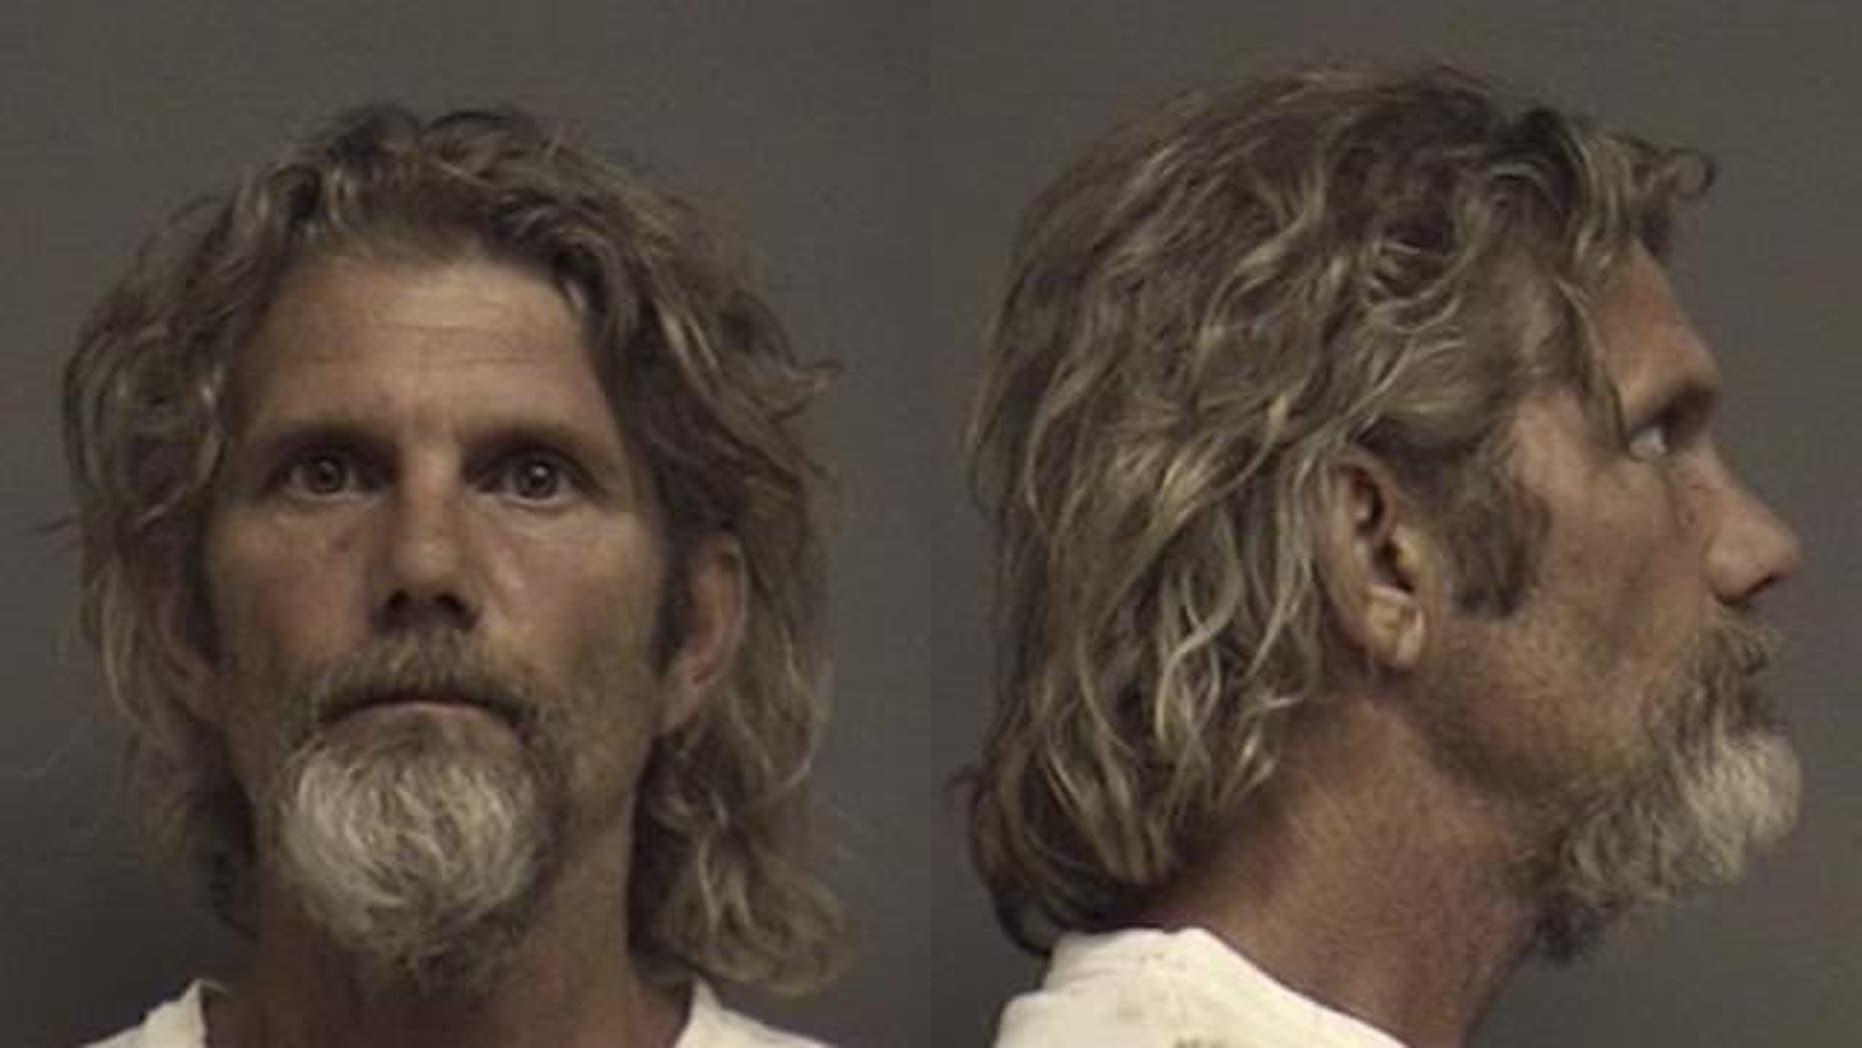 Thomas Fechtler was arrested by police in Alabama.